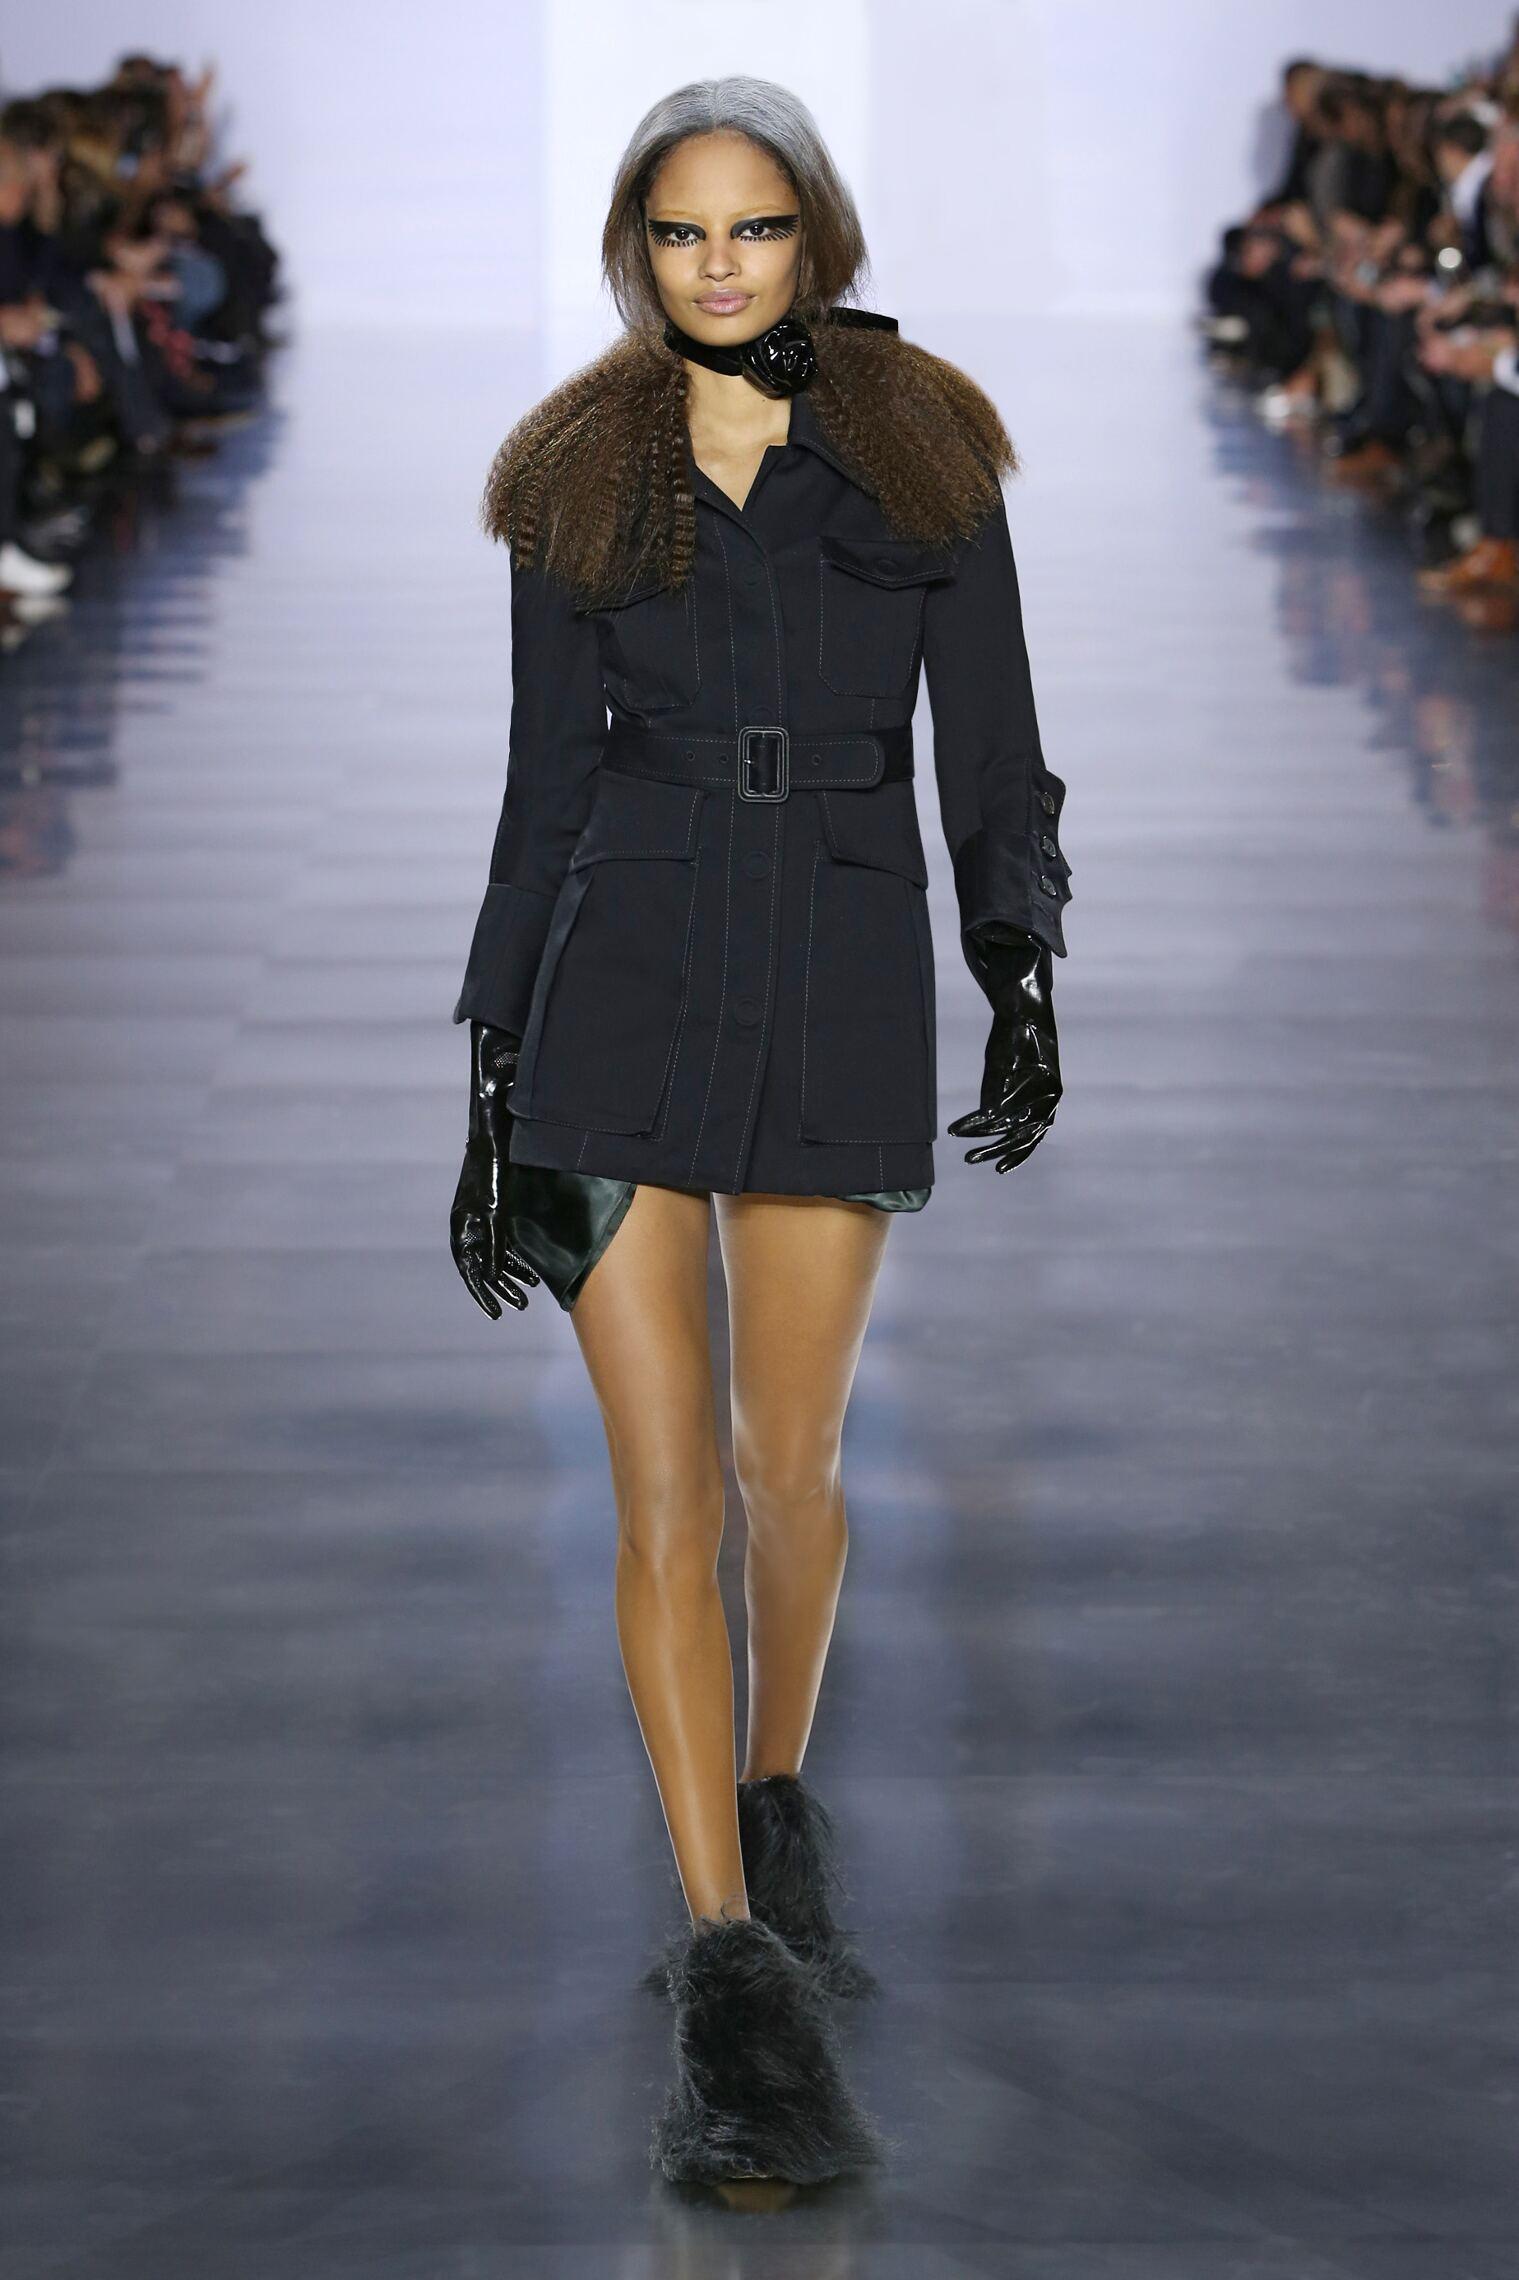 Maison Margiela Fall Winter 2015 16 Womens Collection Paris Fashion Week